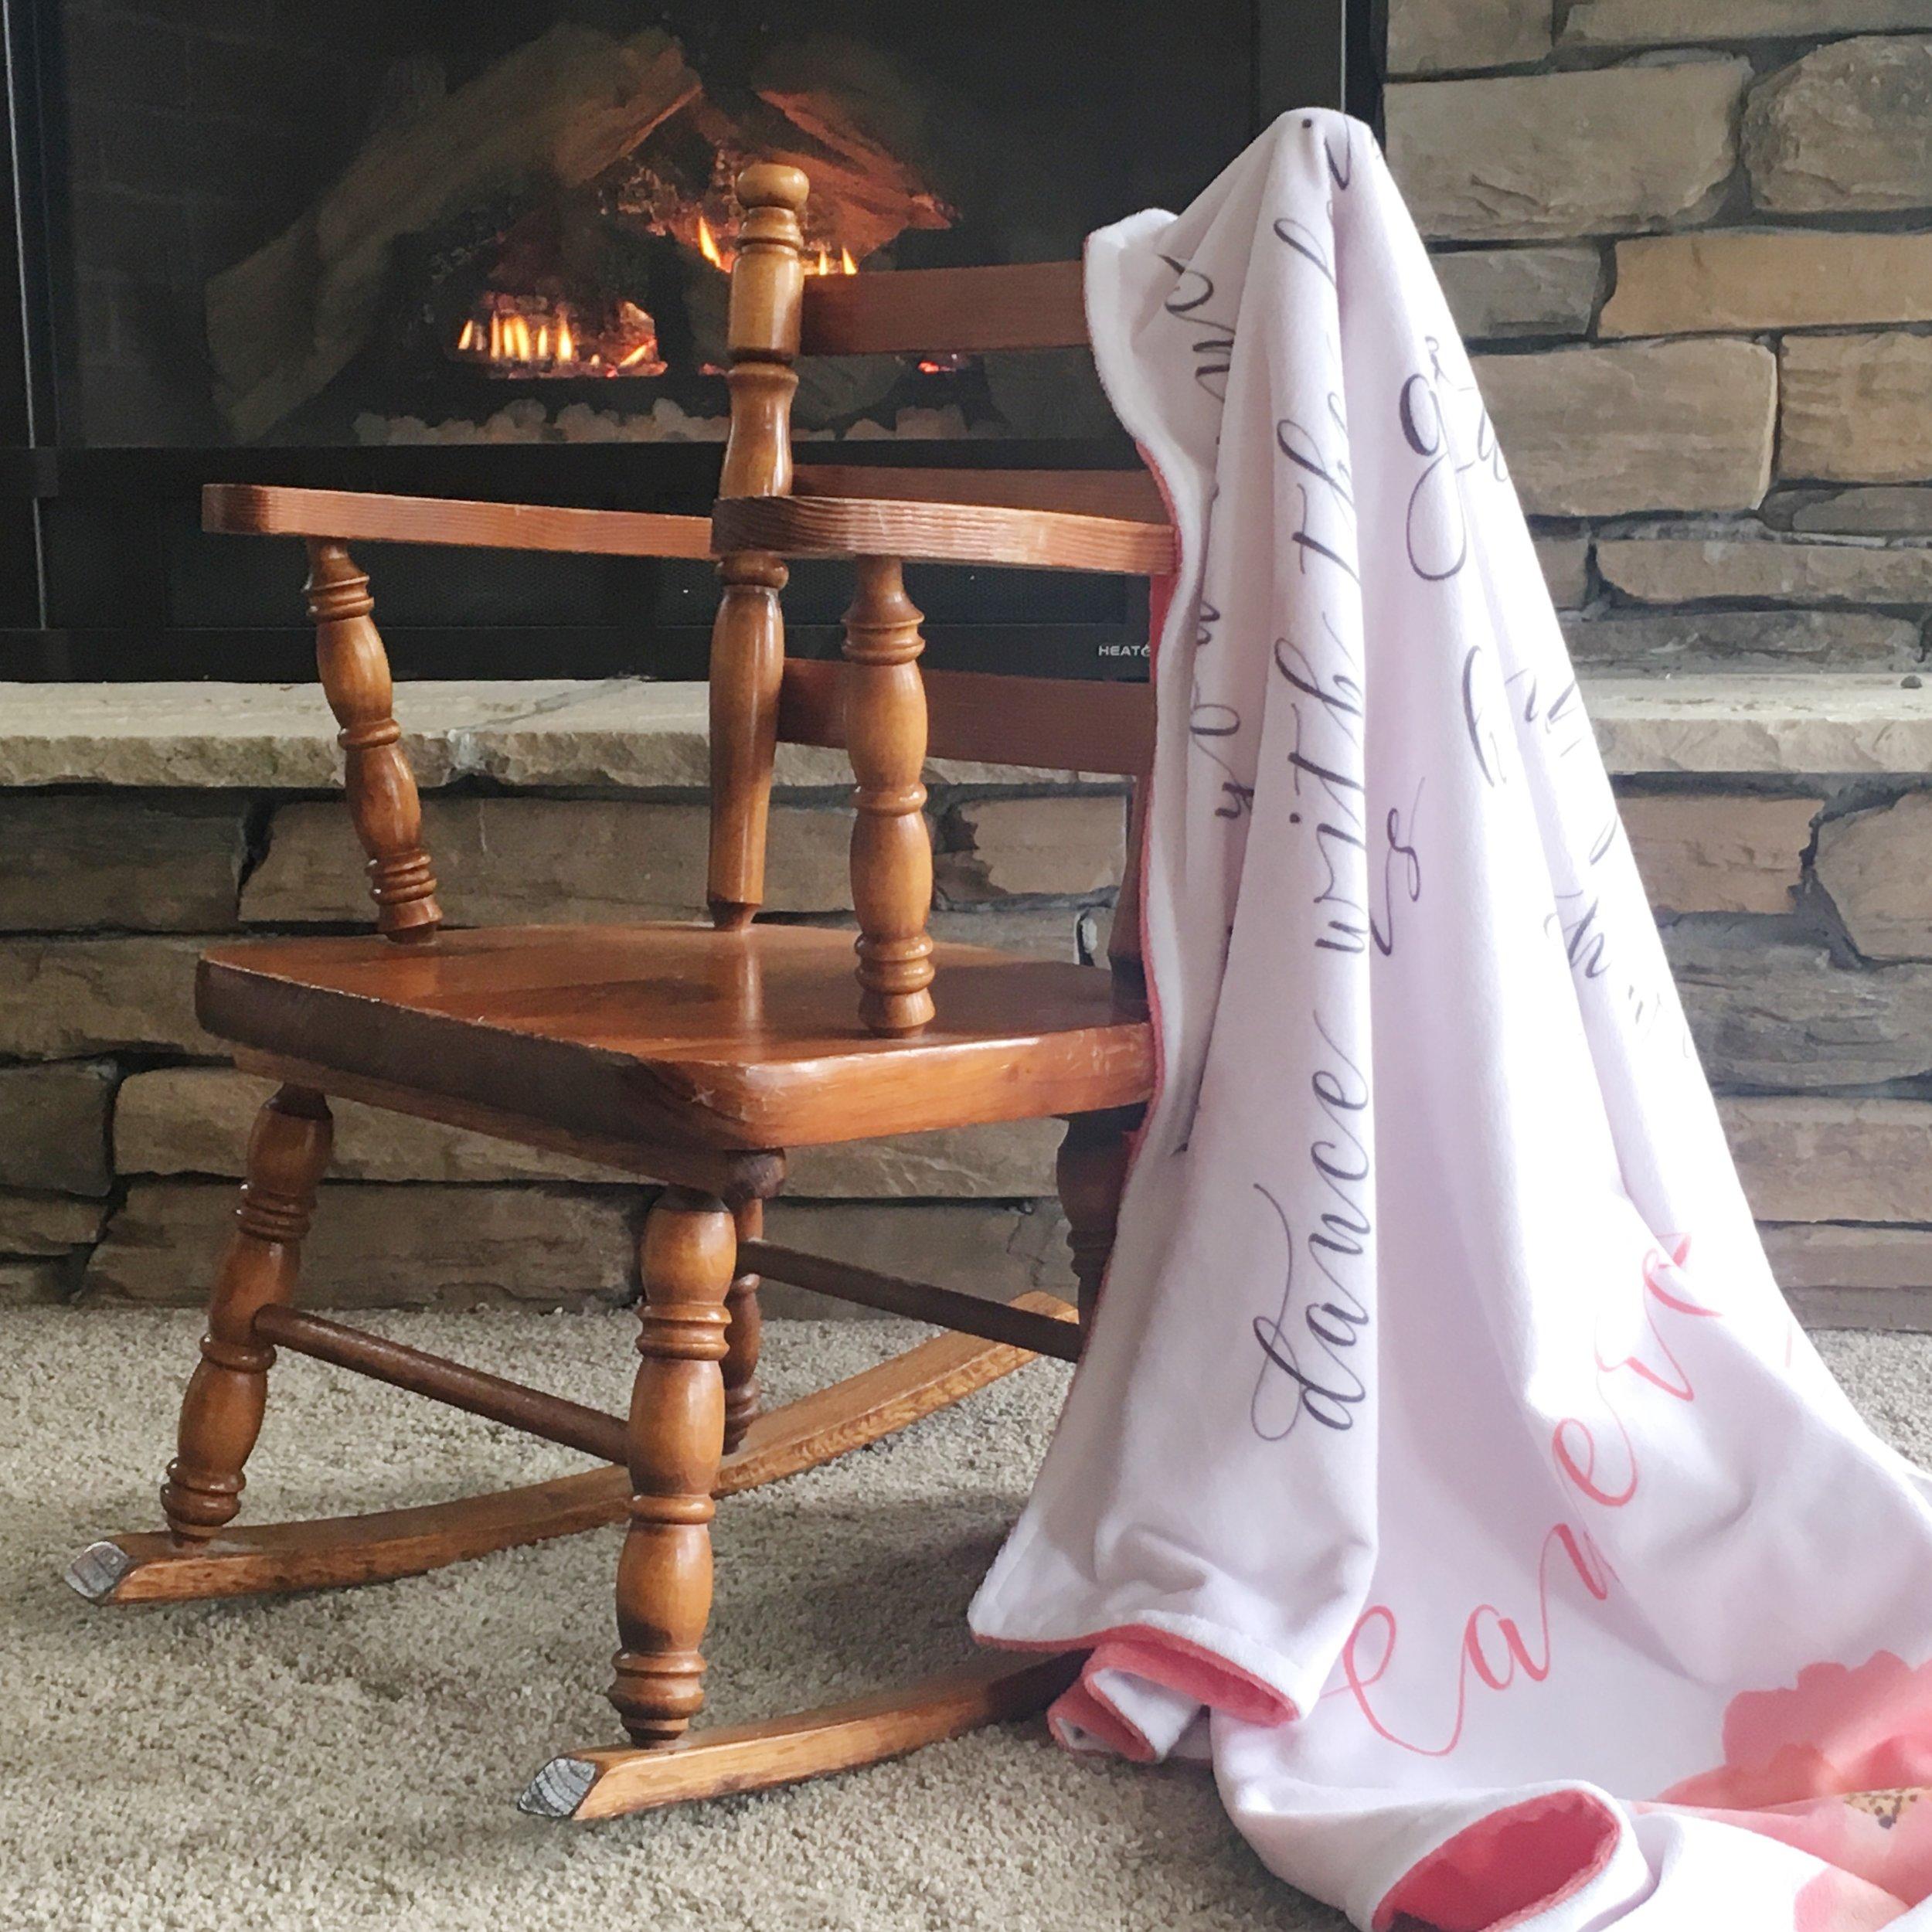 Central PA, Baby Blanket, Hand lettered, JesSmith Designs, Invitations, custom-03-29 10.46.48.jpg